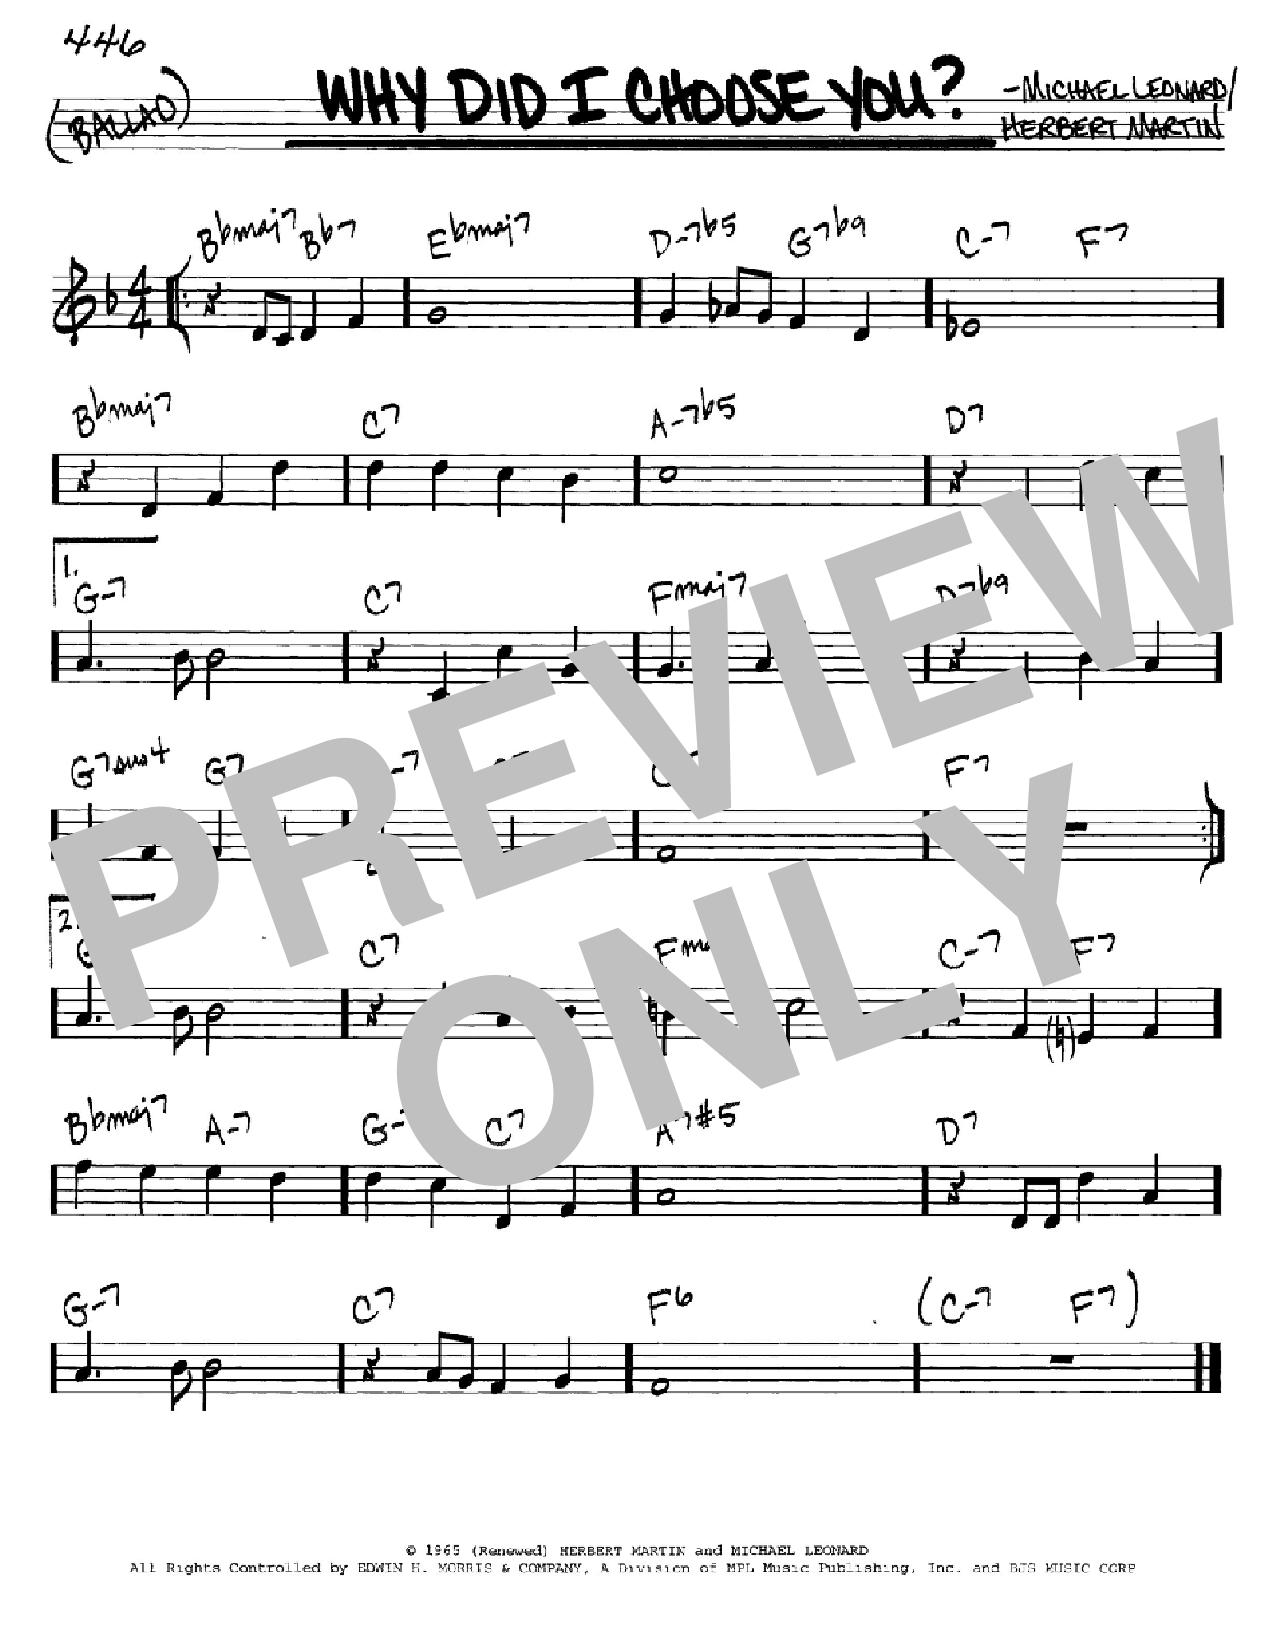 hal leonard real jazz book pdf